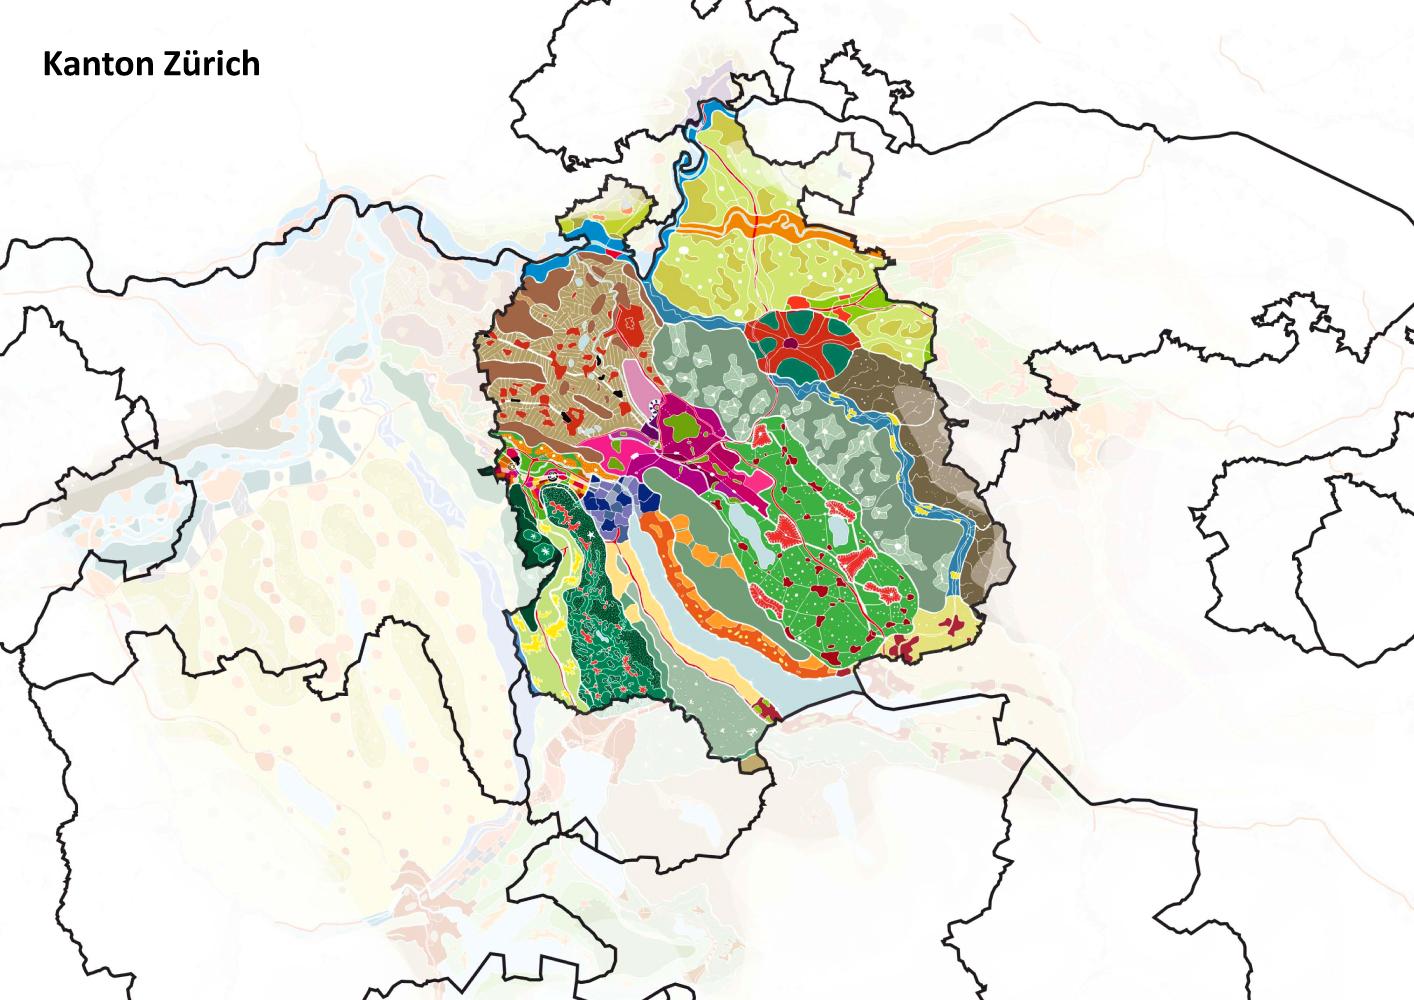 Eva Plass: <strong>Metropolitanregion Zürich</strong><br> &ndash; Kooperative Studie Raumplanung / bei Integral Ruedi Baur Zürich / 2010